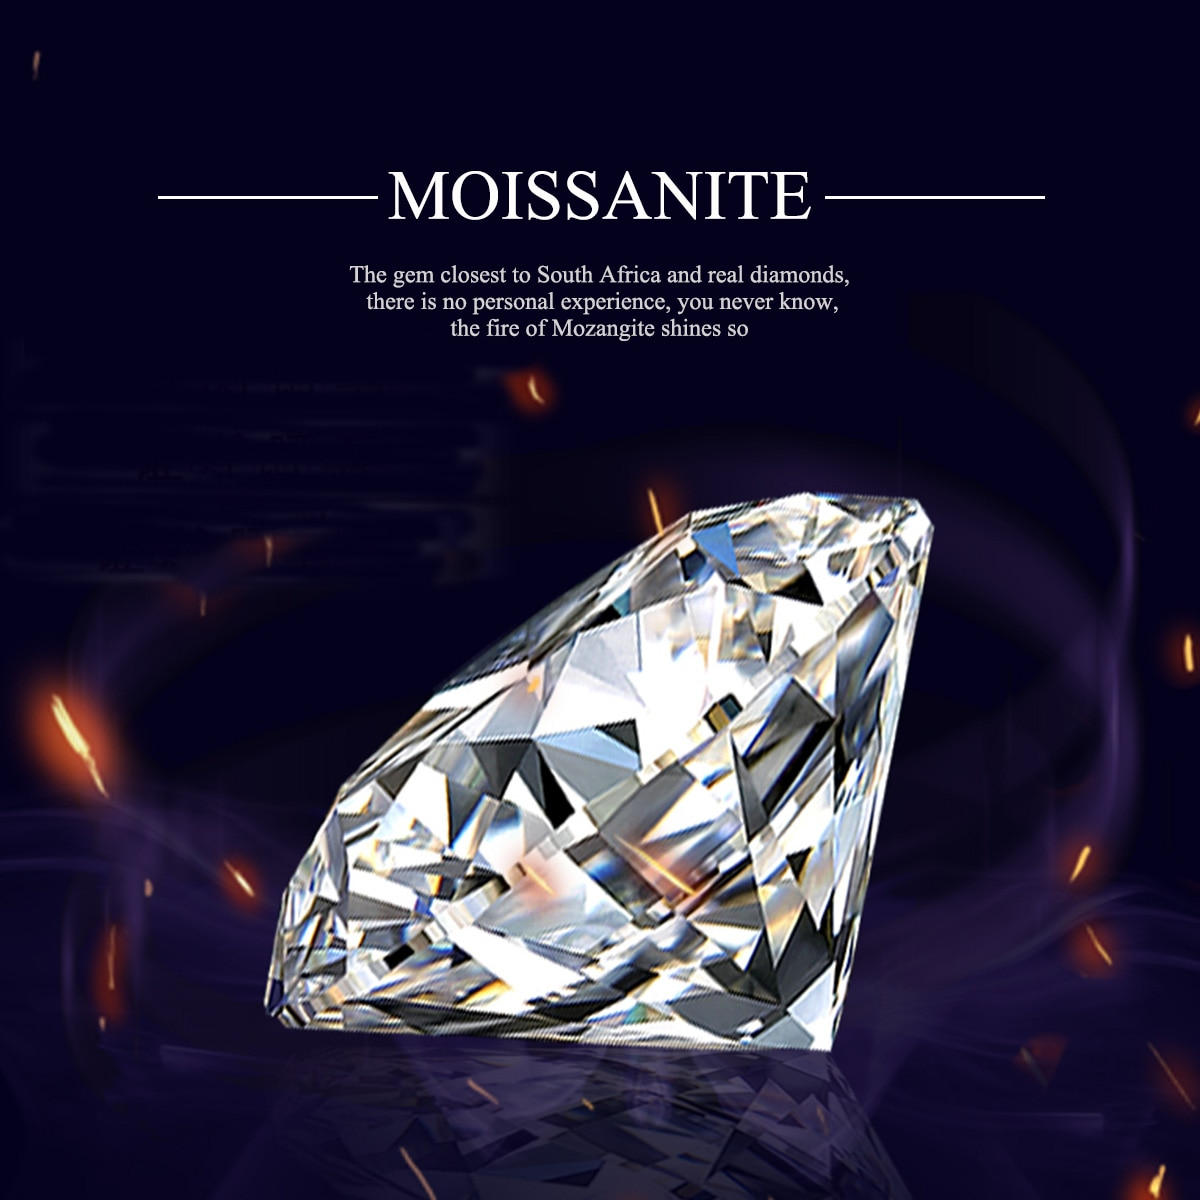 Real 100% Samll Loose Gemstones Moissanite Stone 0.2ct 3.5mm D Color VVS1 Gemstone Round Shape